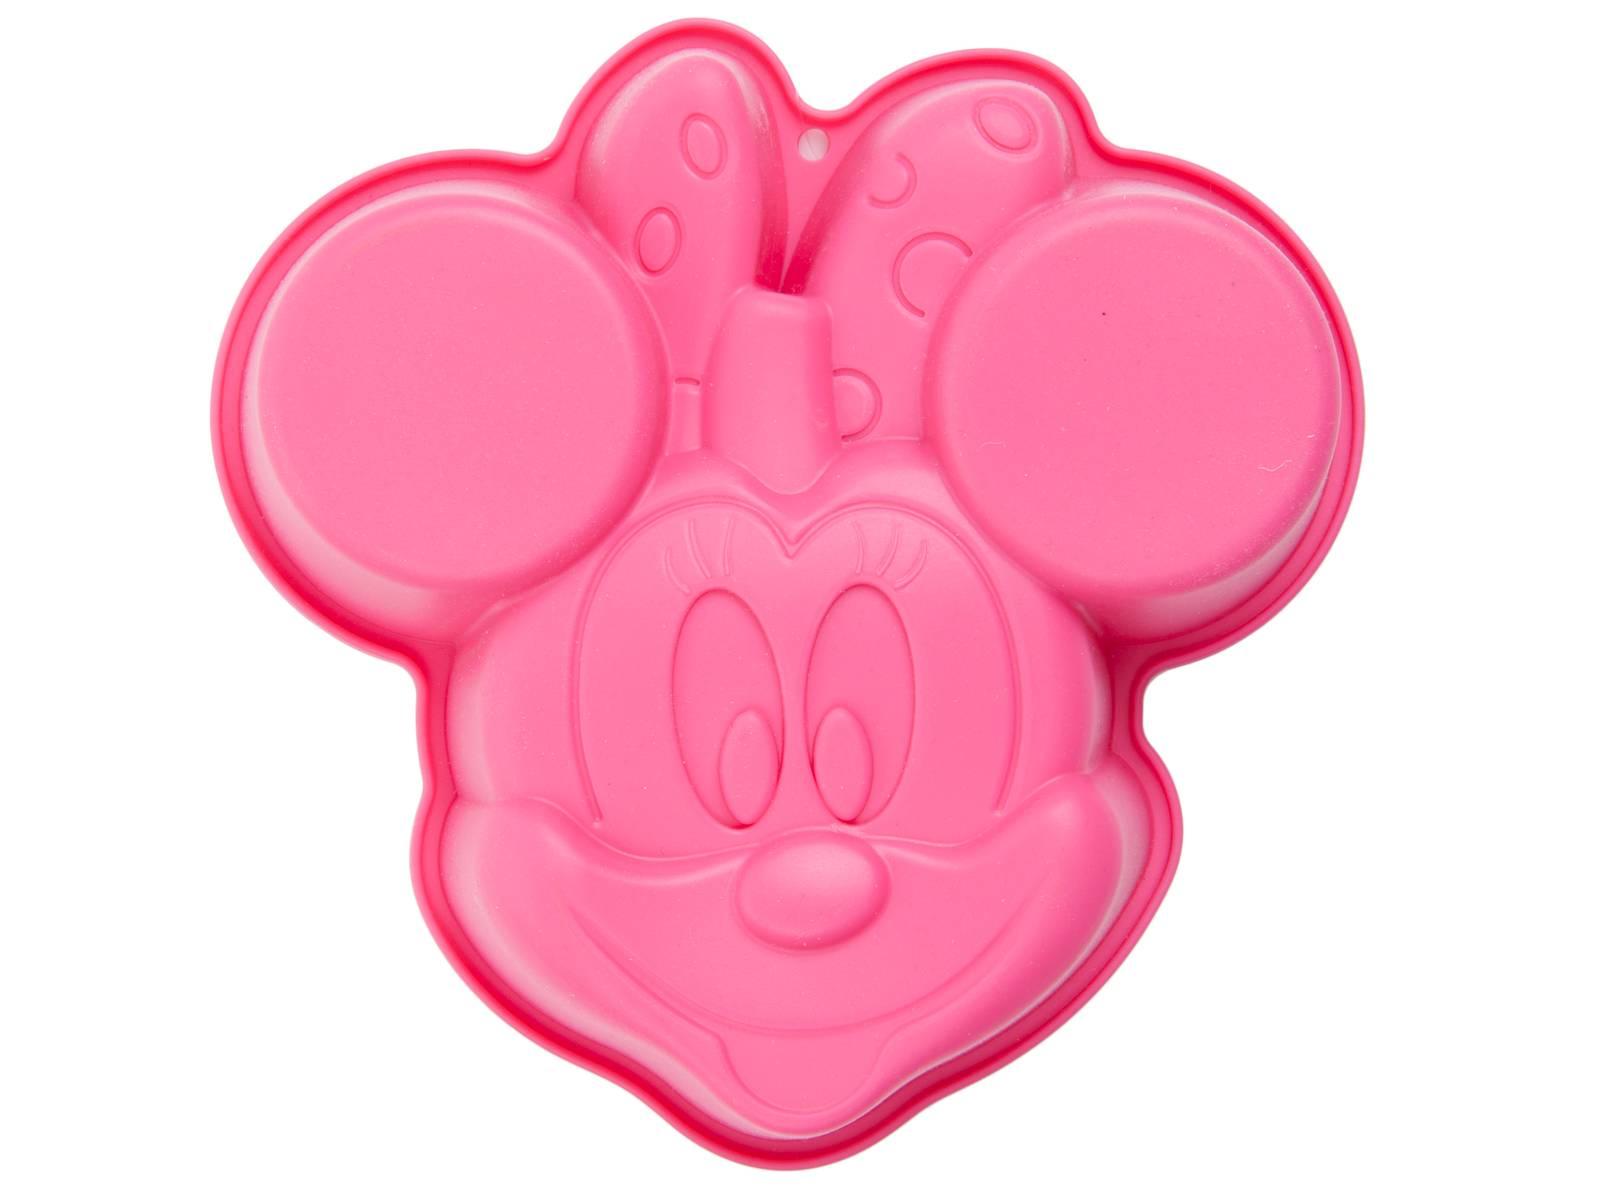 Silicone mold Minnie 19,5 x 19 cm pink DISNEY